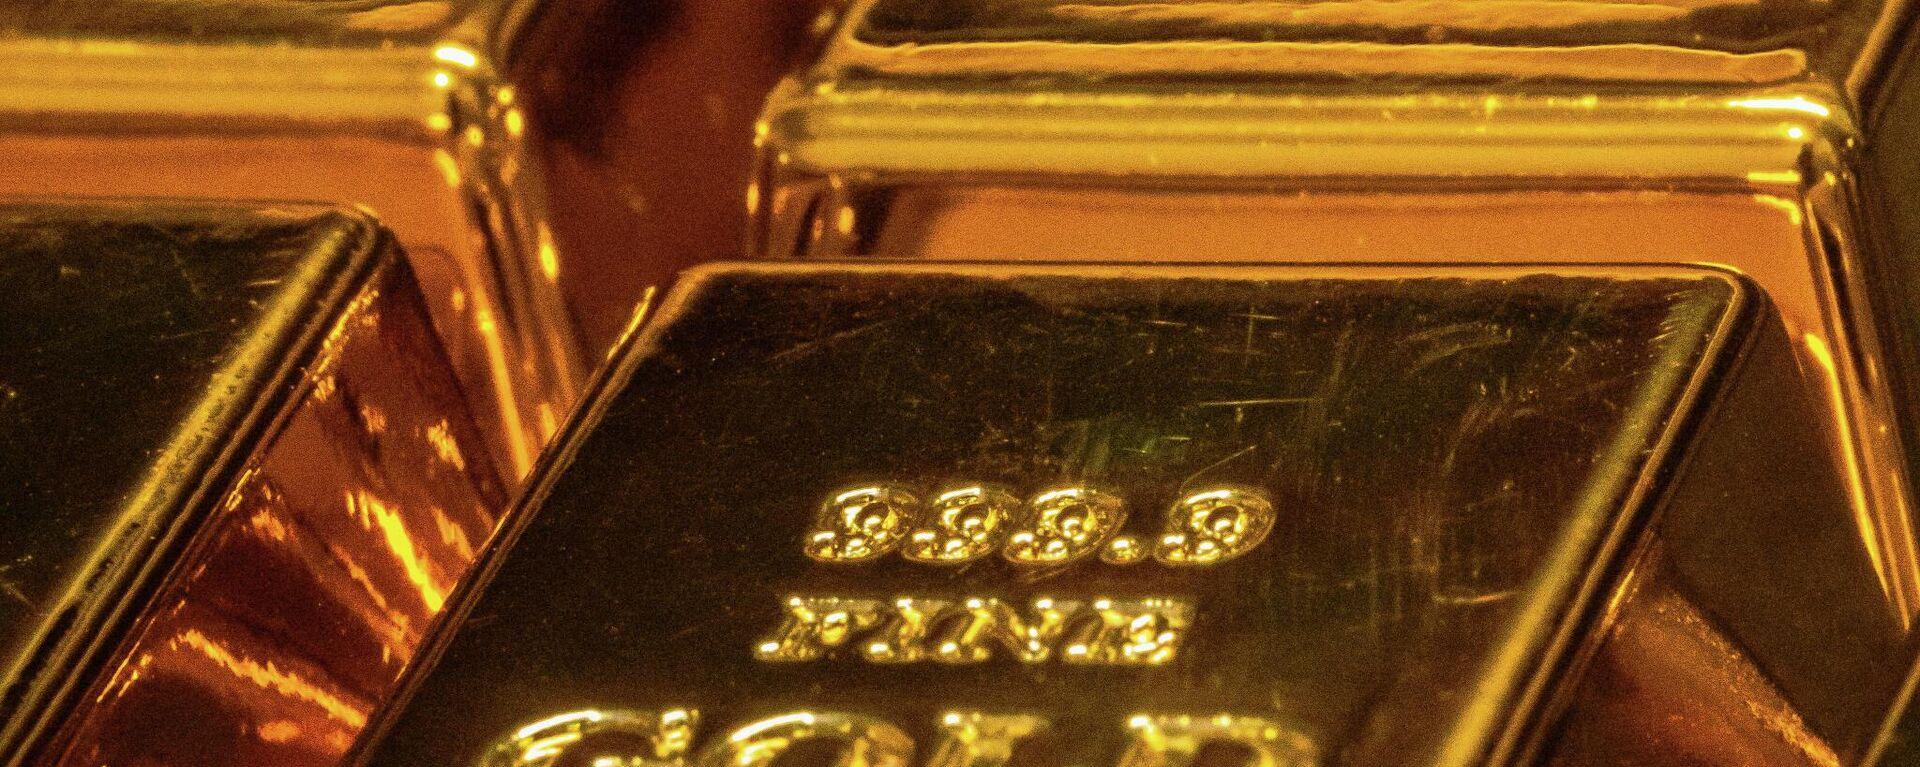 Слитки золота - Sputnik Узбекистан, 1920, 29.09.2021